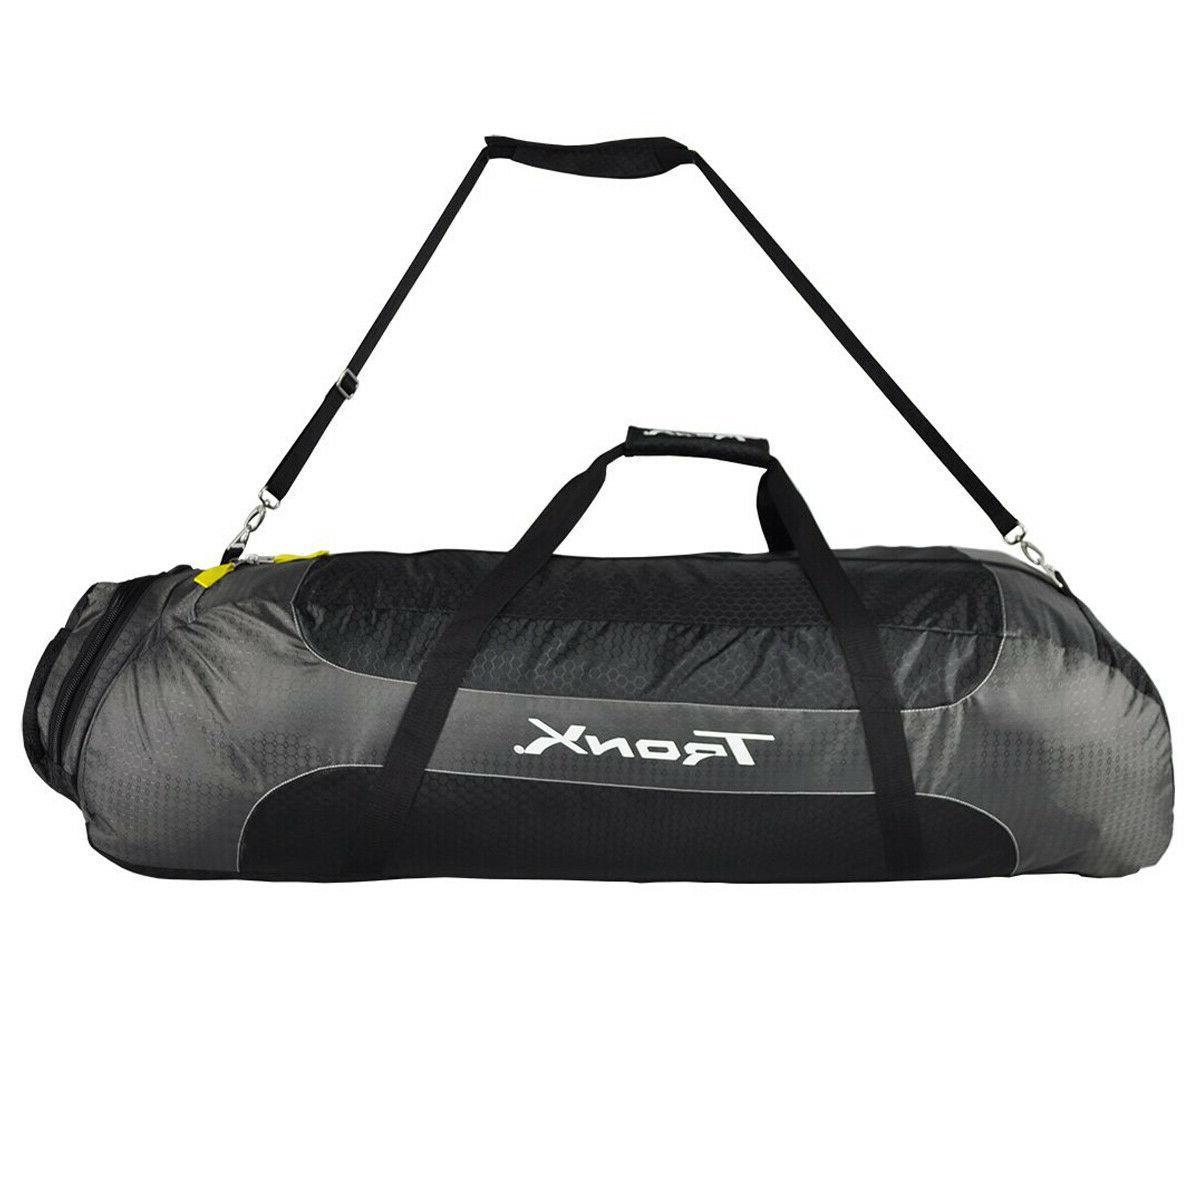 lx prox lacrosse equipment bag black gray